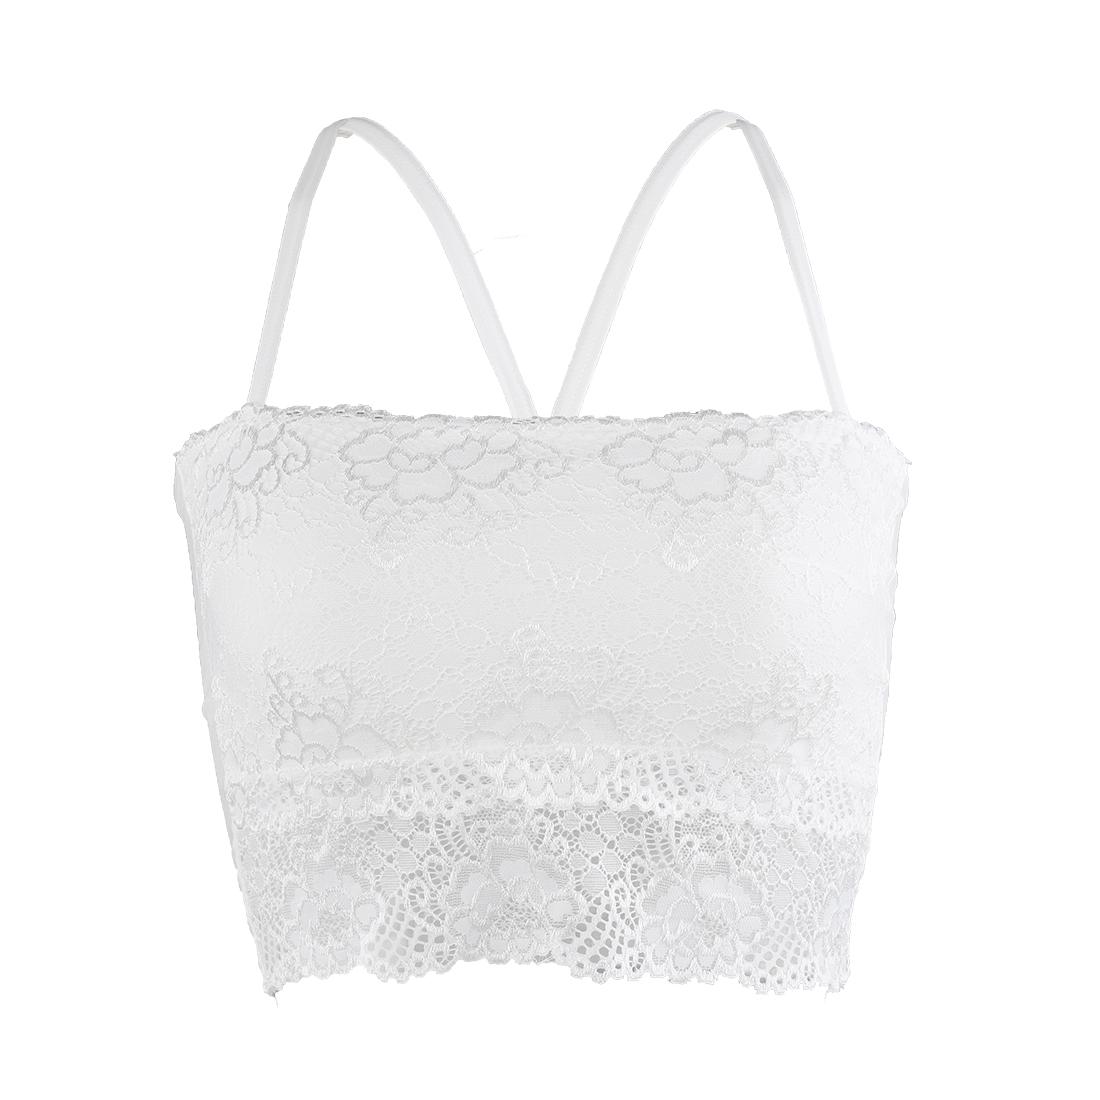 Women Lightweight Back Floral Crochet Straps Lace Decor Bra Top White One Size